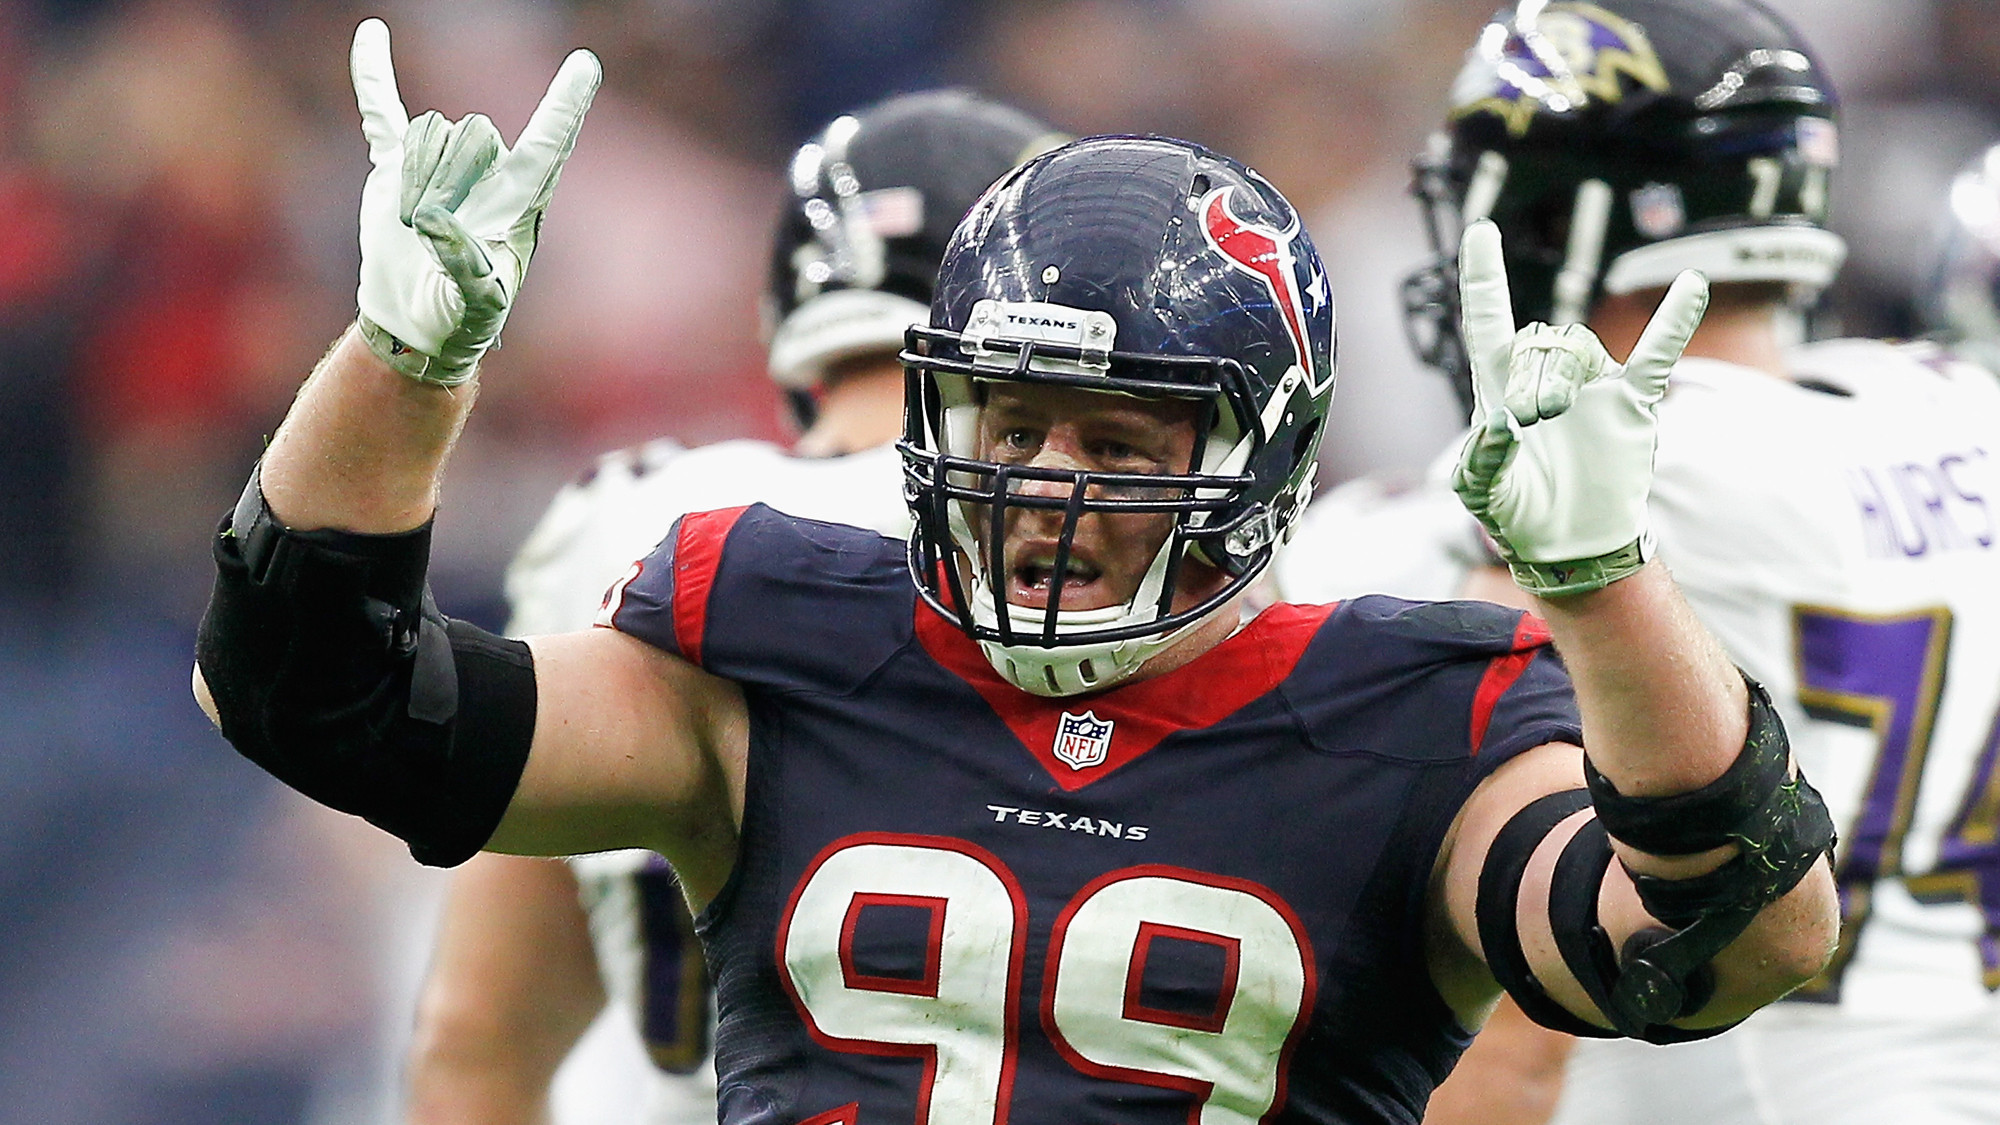 J J Watt turns up the volume as Texans defense dominates Ravens